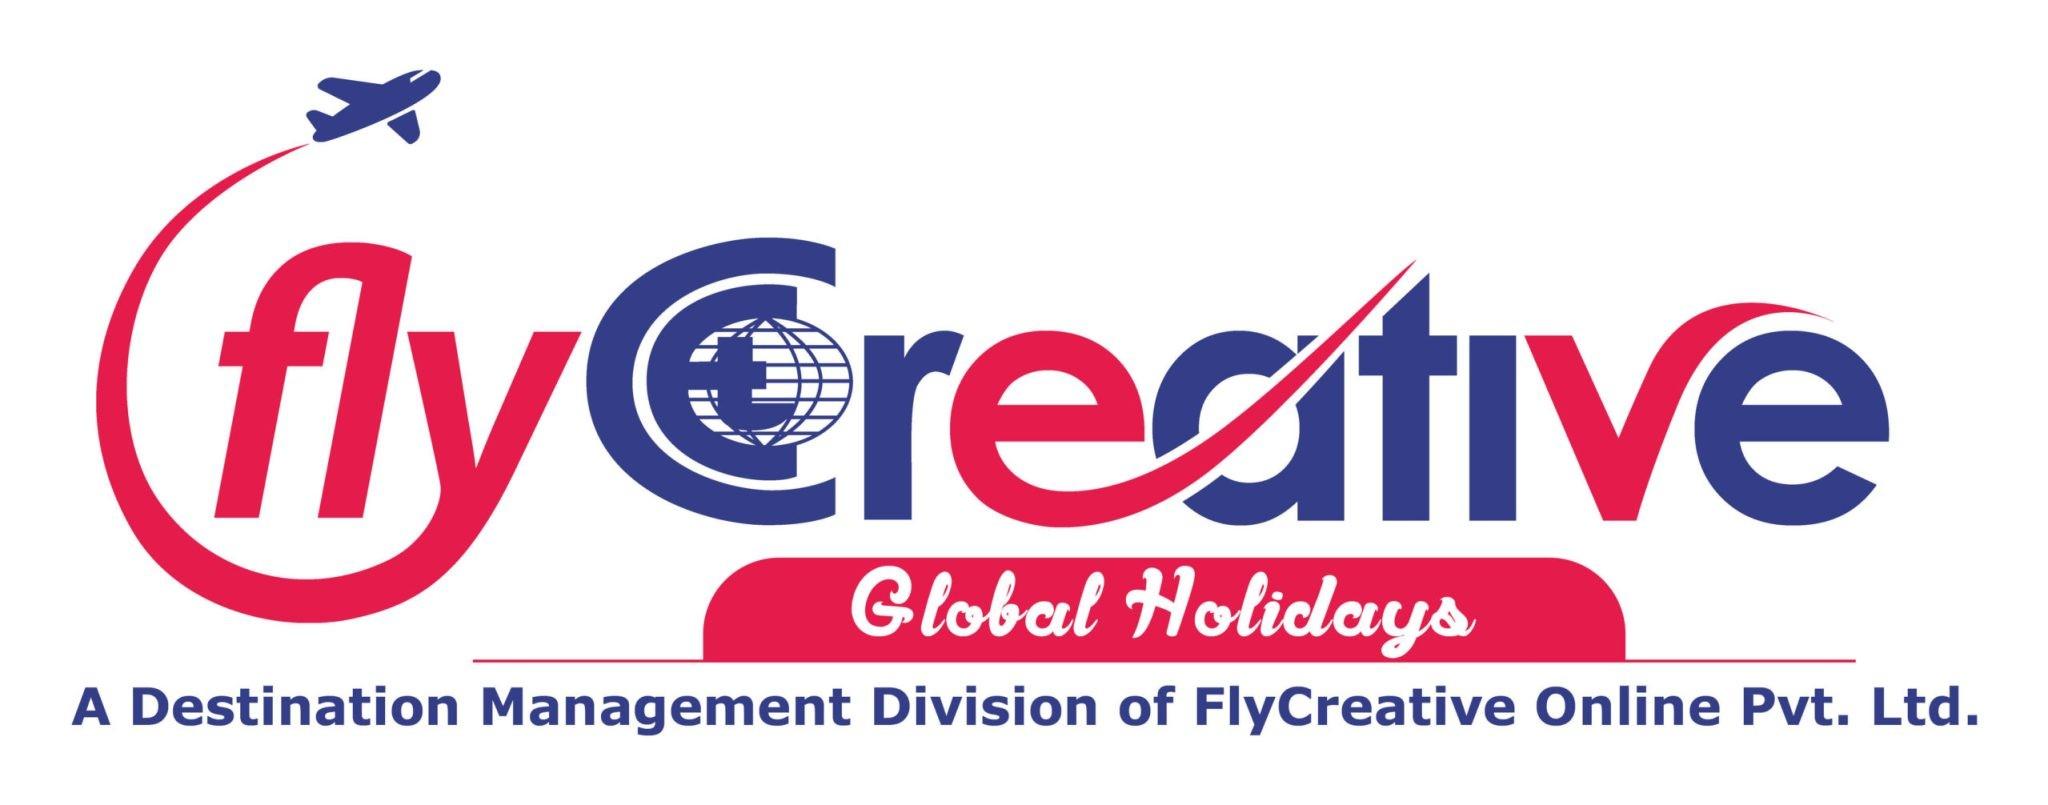 Fly Creative Global